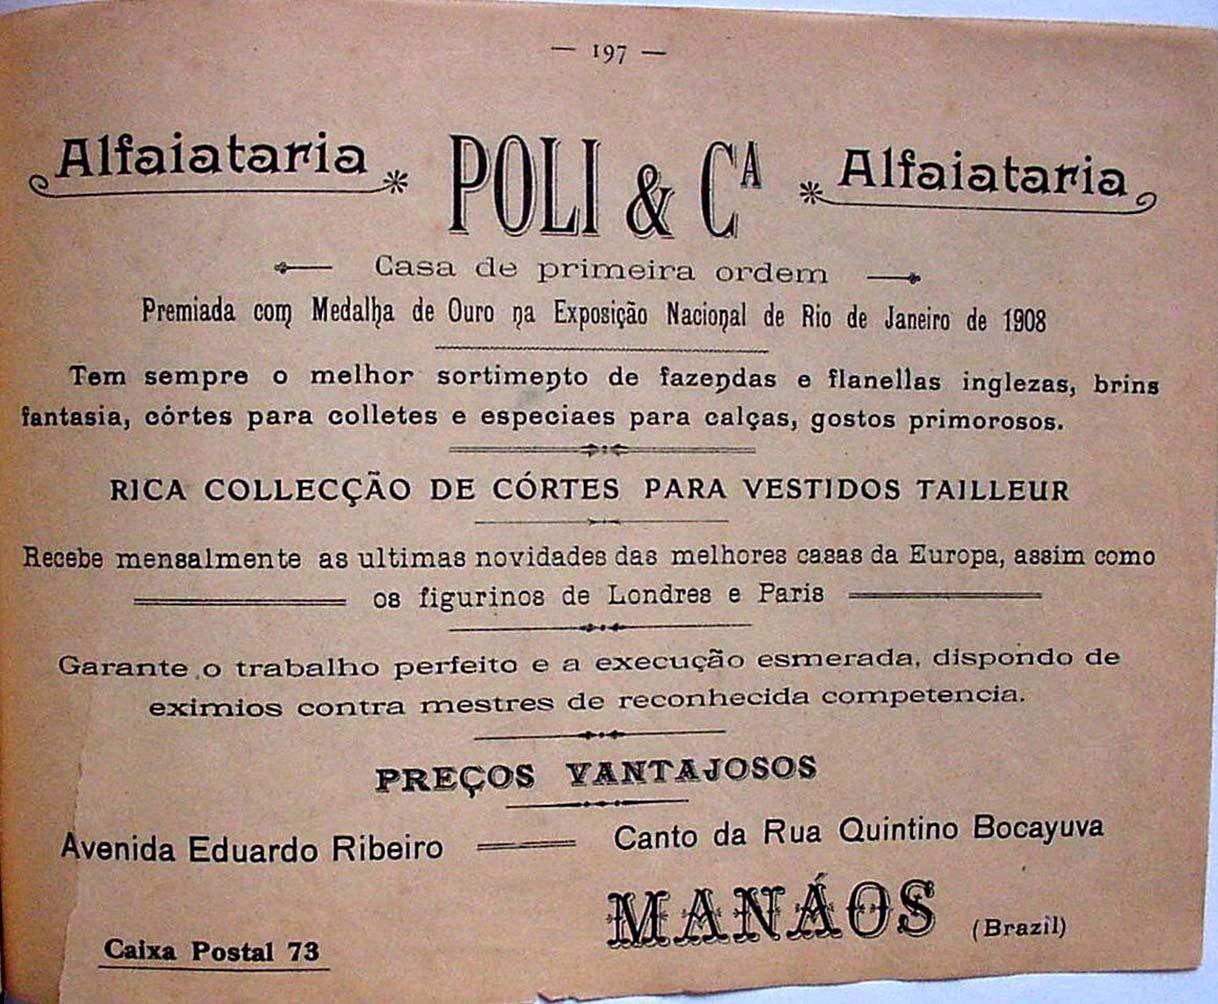 Anúncio da Grande Alfaiataria Poli & Cia